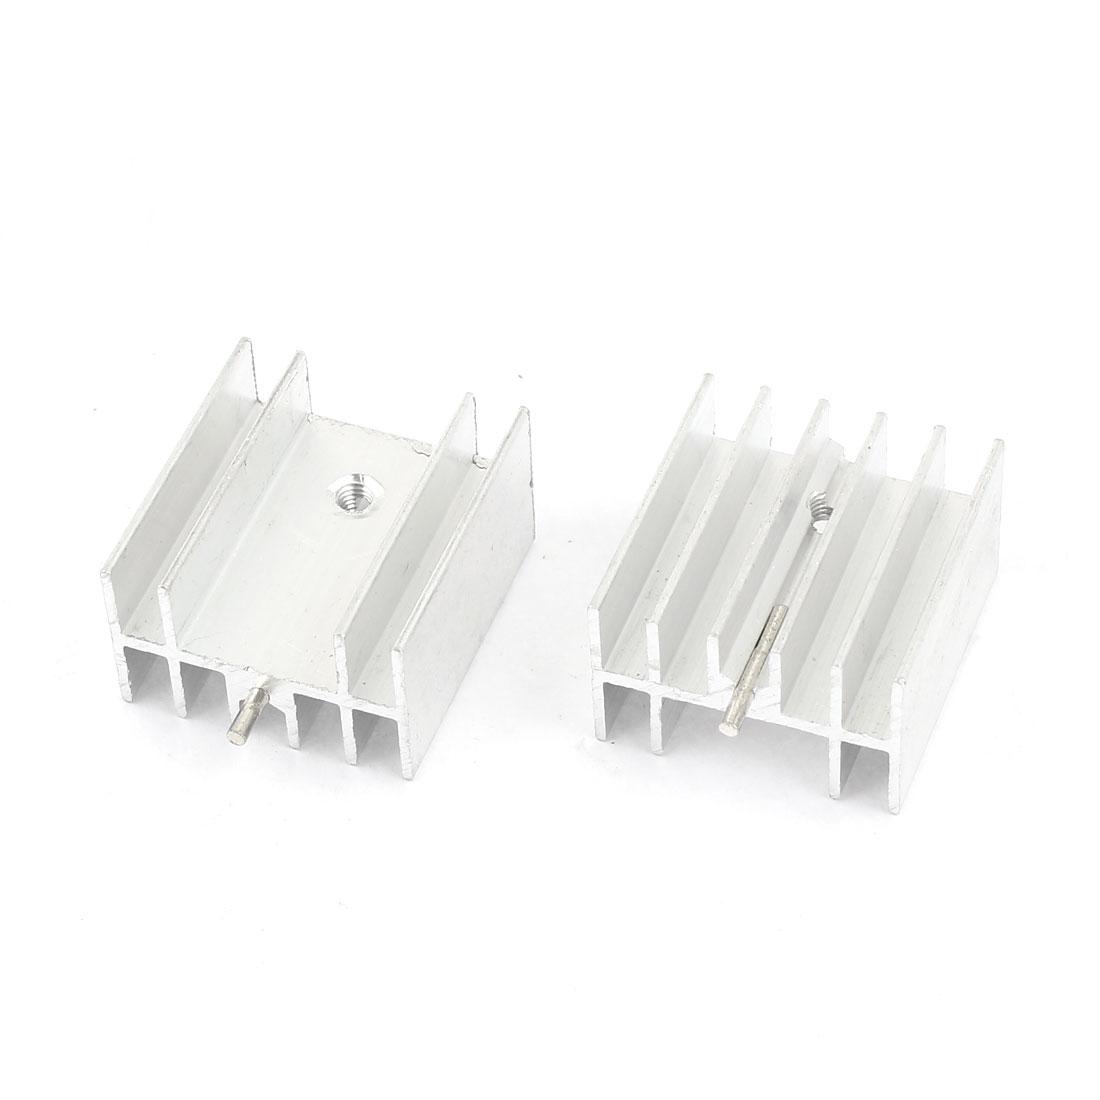 2 Pcs Silver Tone Aluminum Heat Sink Heatsink 23x16x25mm for TO220 Transistor